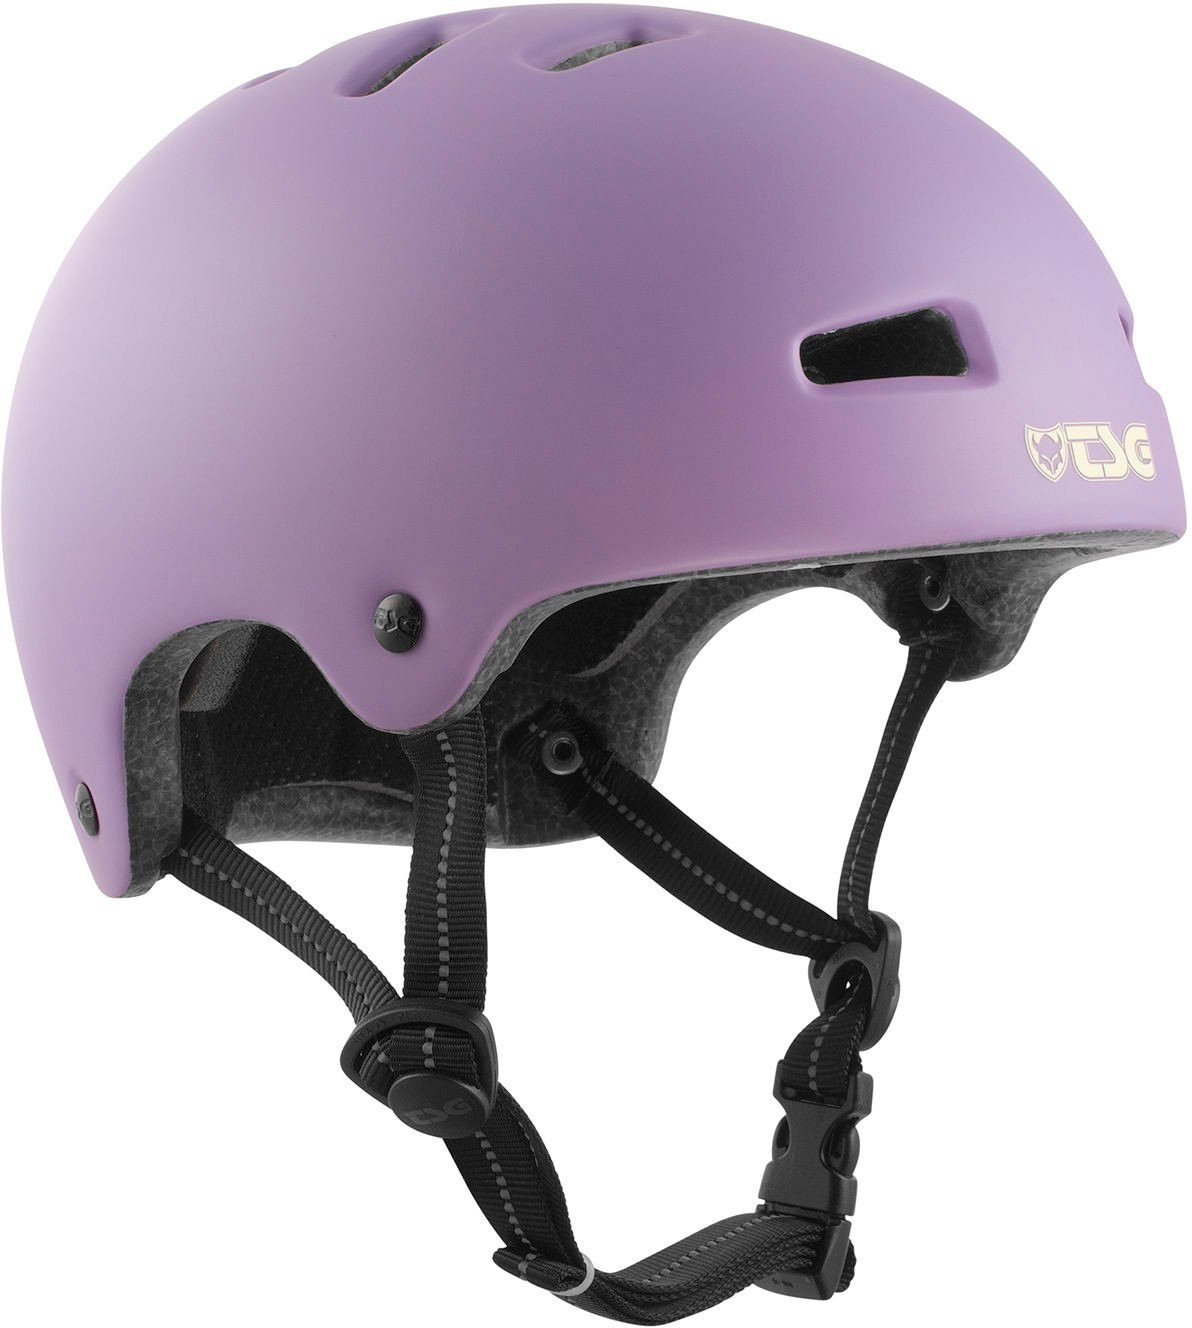 TSG Fahrradhelm »Nipper Mini Solid Color Helmet«